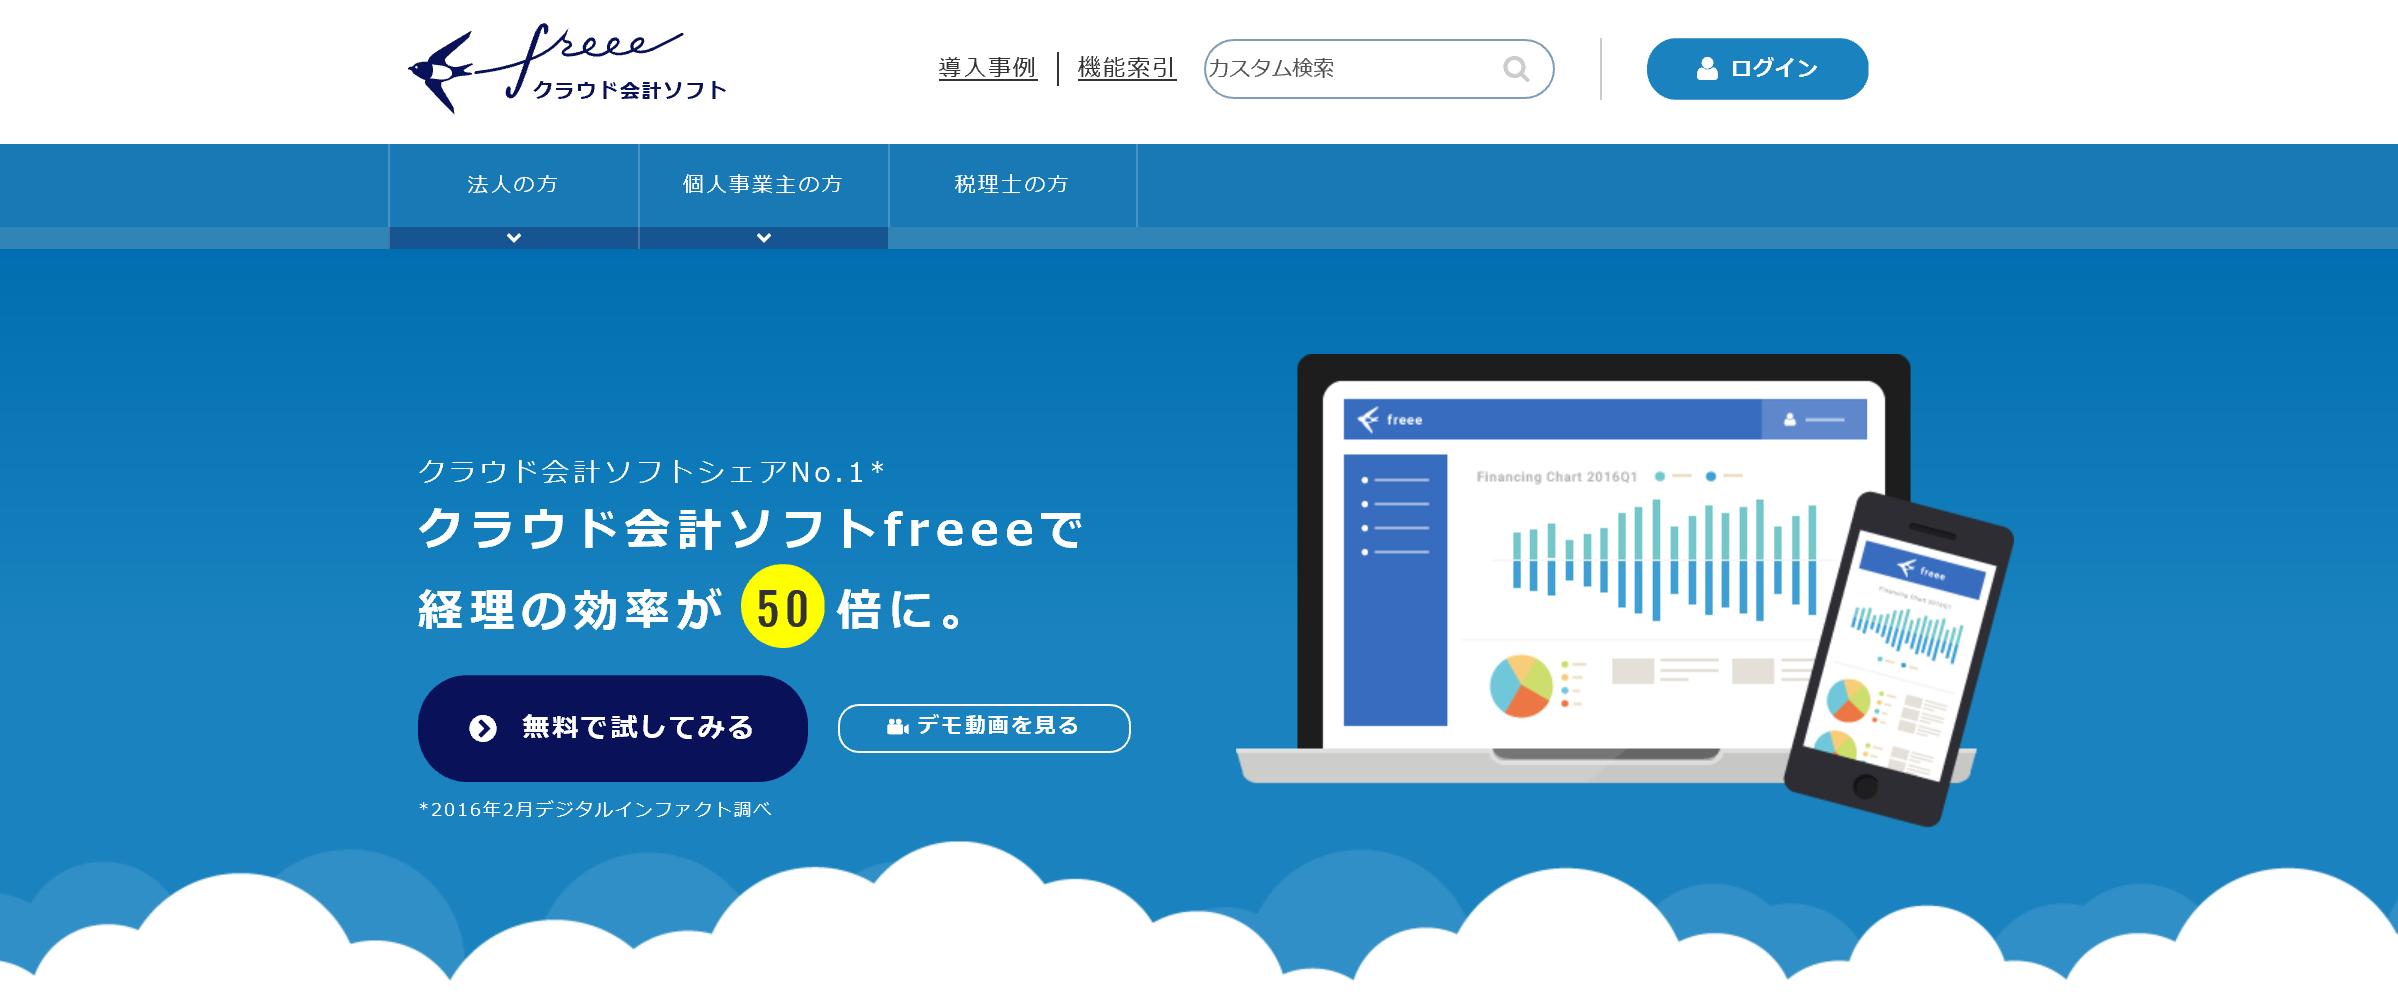 freee 会計